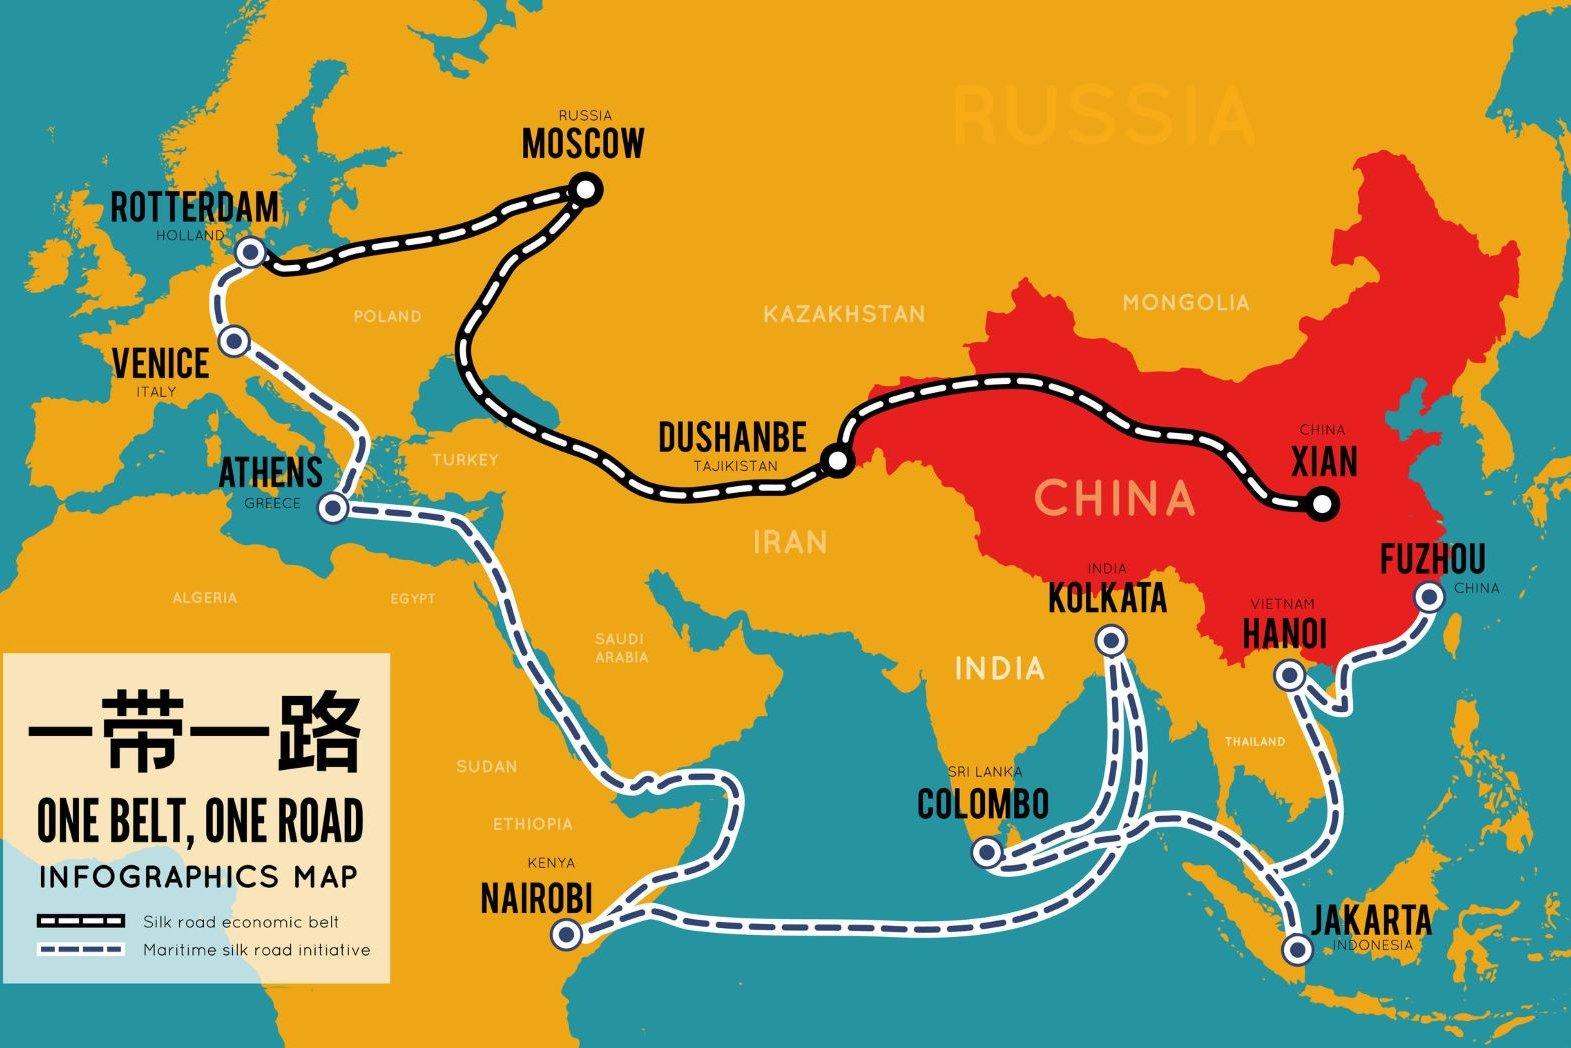 Pertarungan Baru Tiongkok dan Jepang di Tanah Air. investasi, jepang, tiongkok, pertarungan jepang dan tiongkok, erick thohir